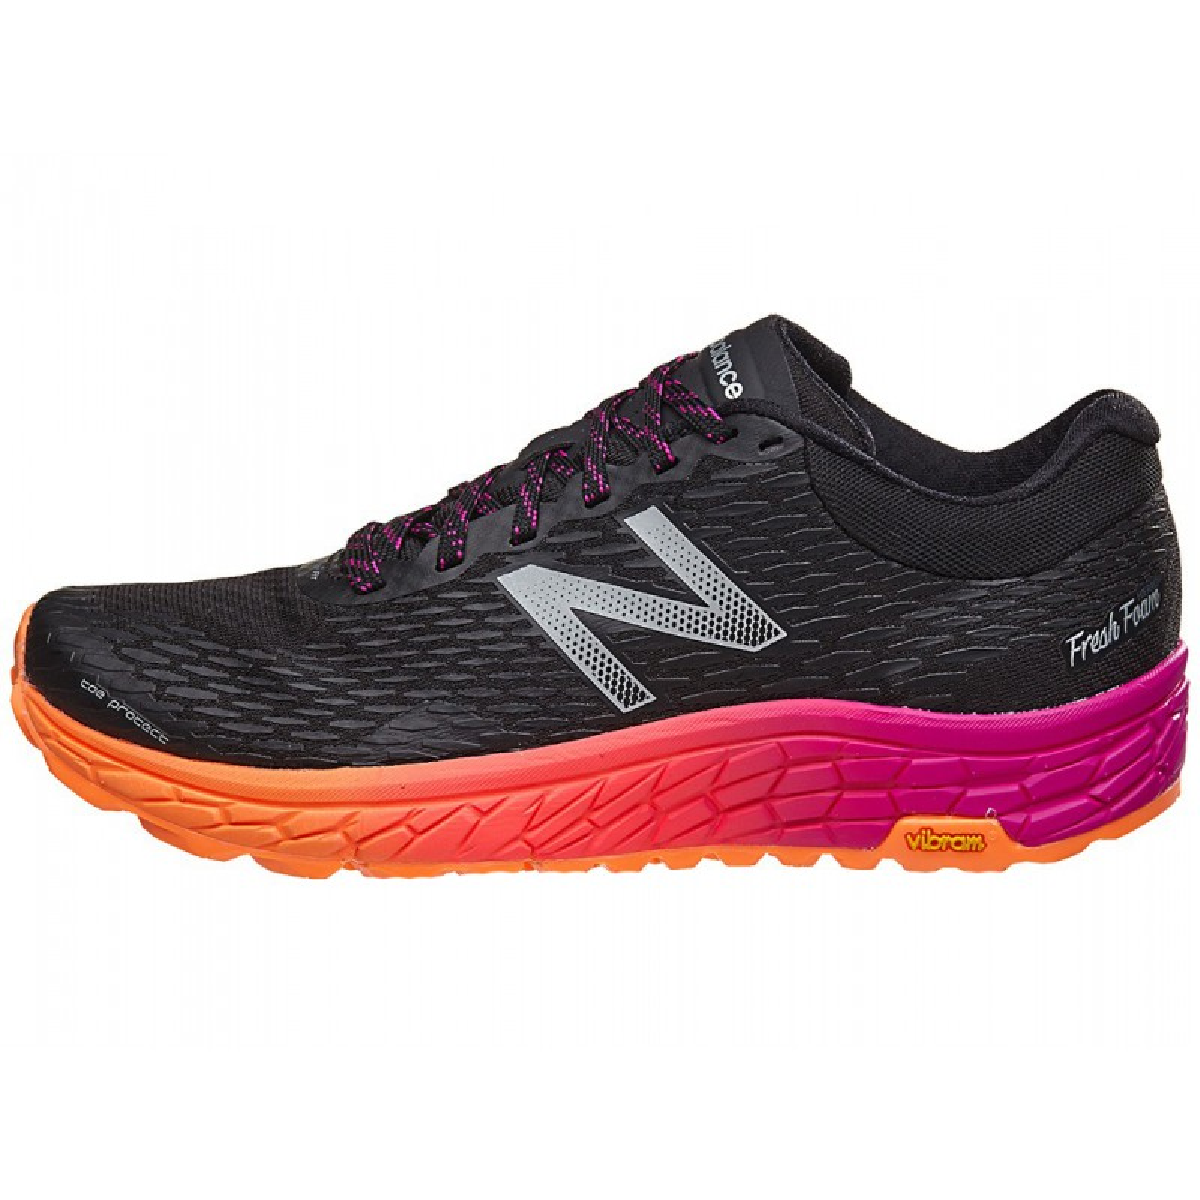 zapatillas new balance mujer 2017 running